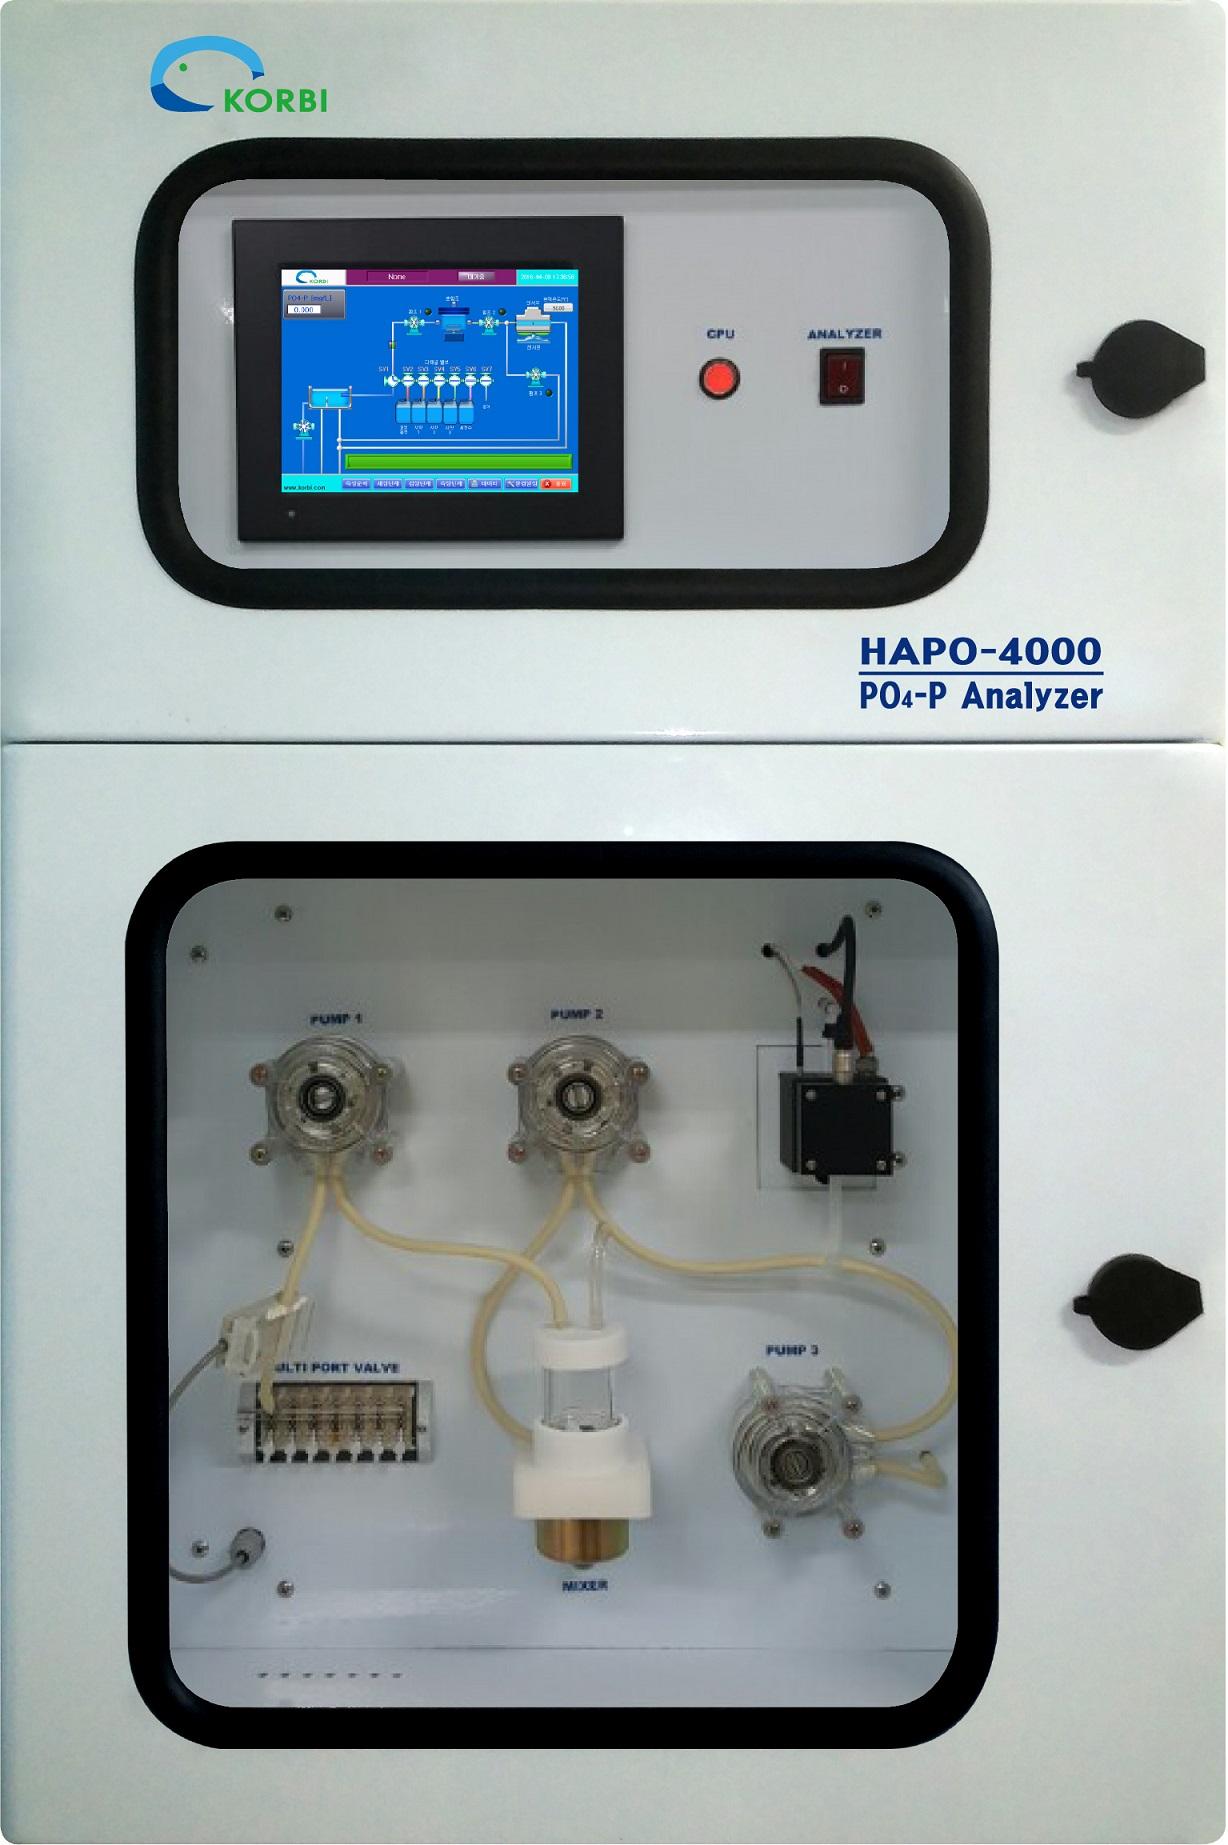 Online Phosphate-Phosphorus Analyzer (HAPO-4000)